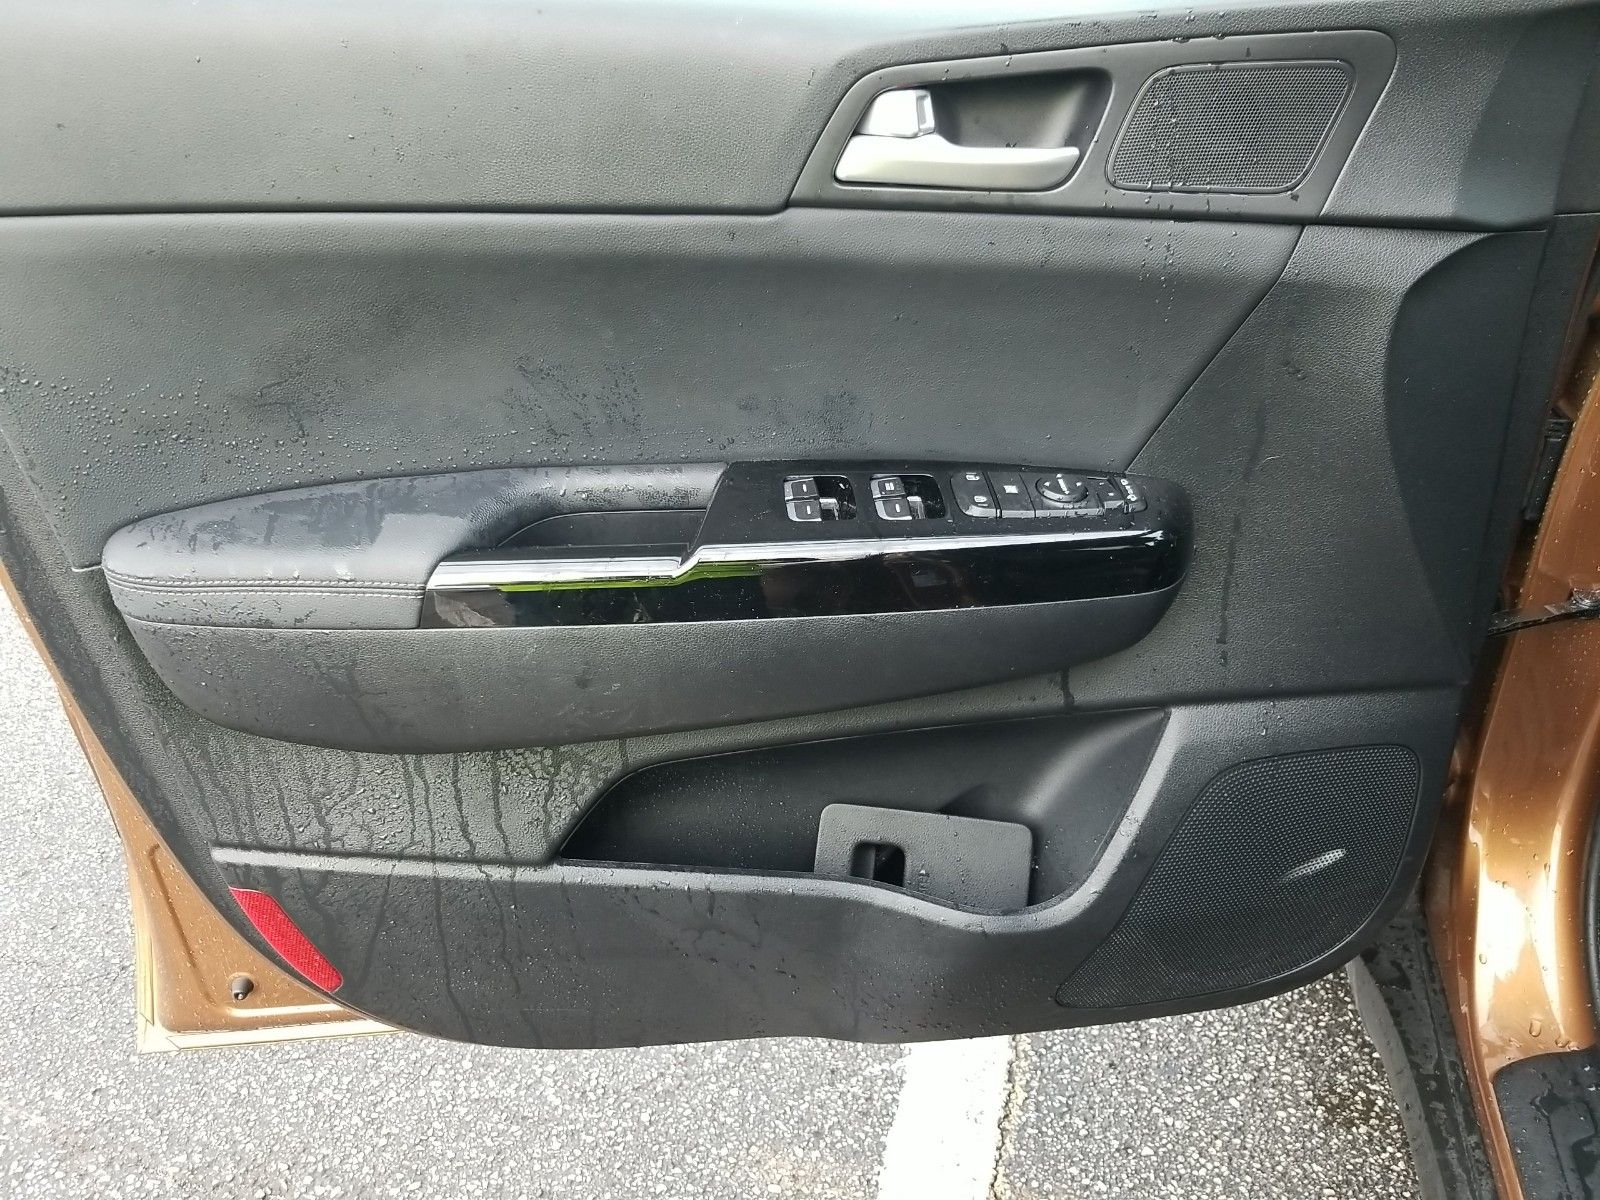 2019 KIA SPORTAGE FWD 4C EX - 9